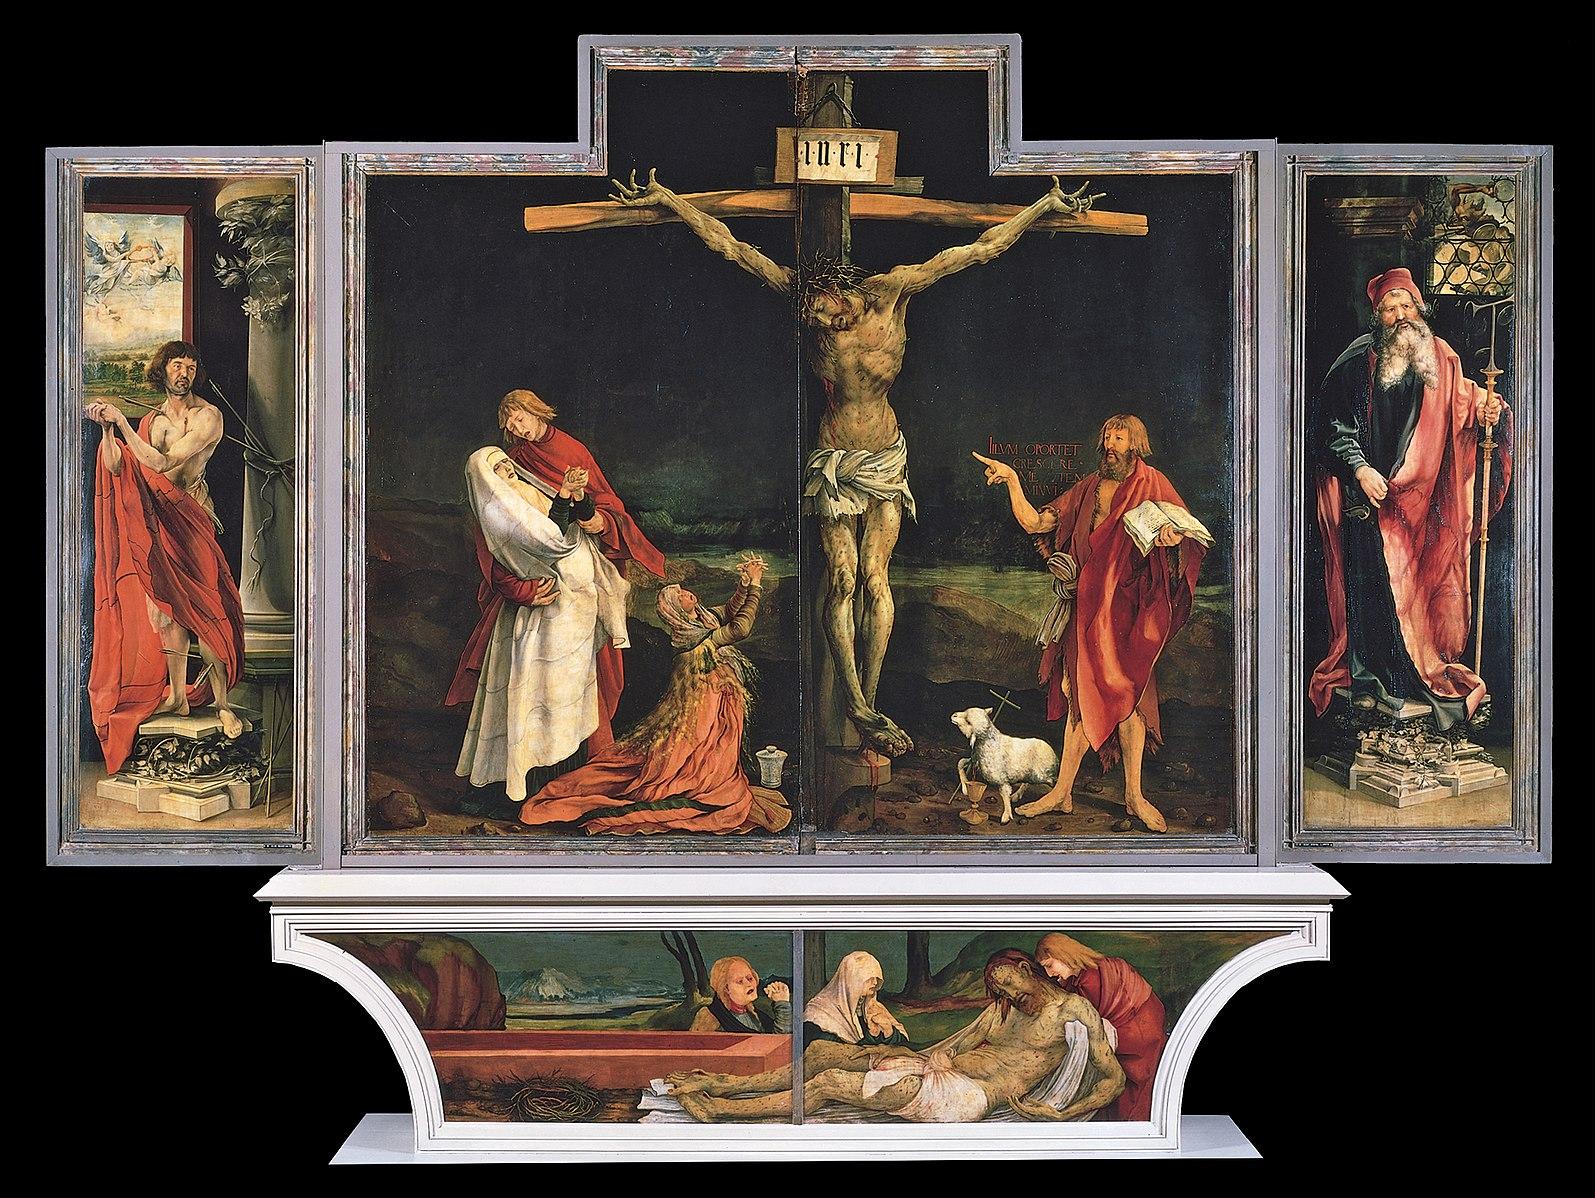 Matthias Grünewald,  Isenheim Altarpiece